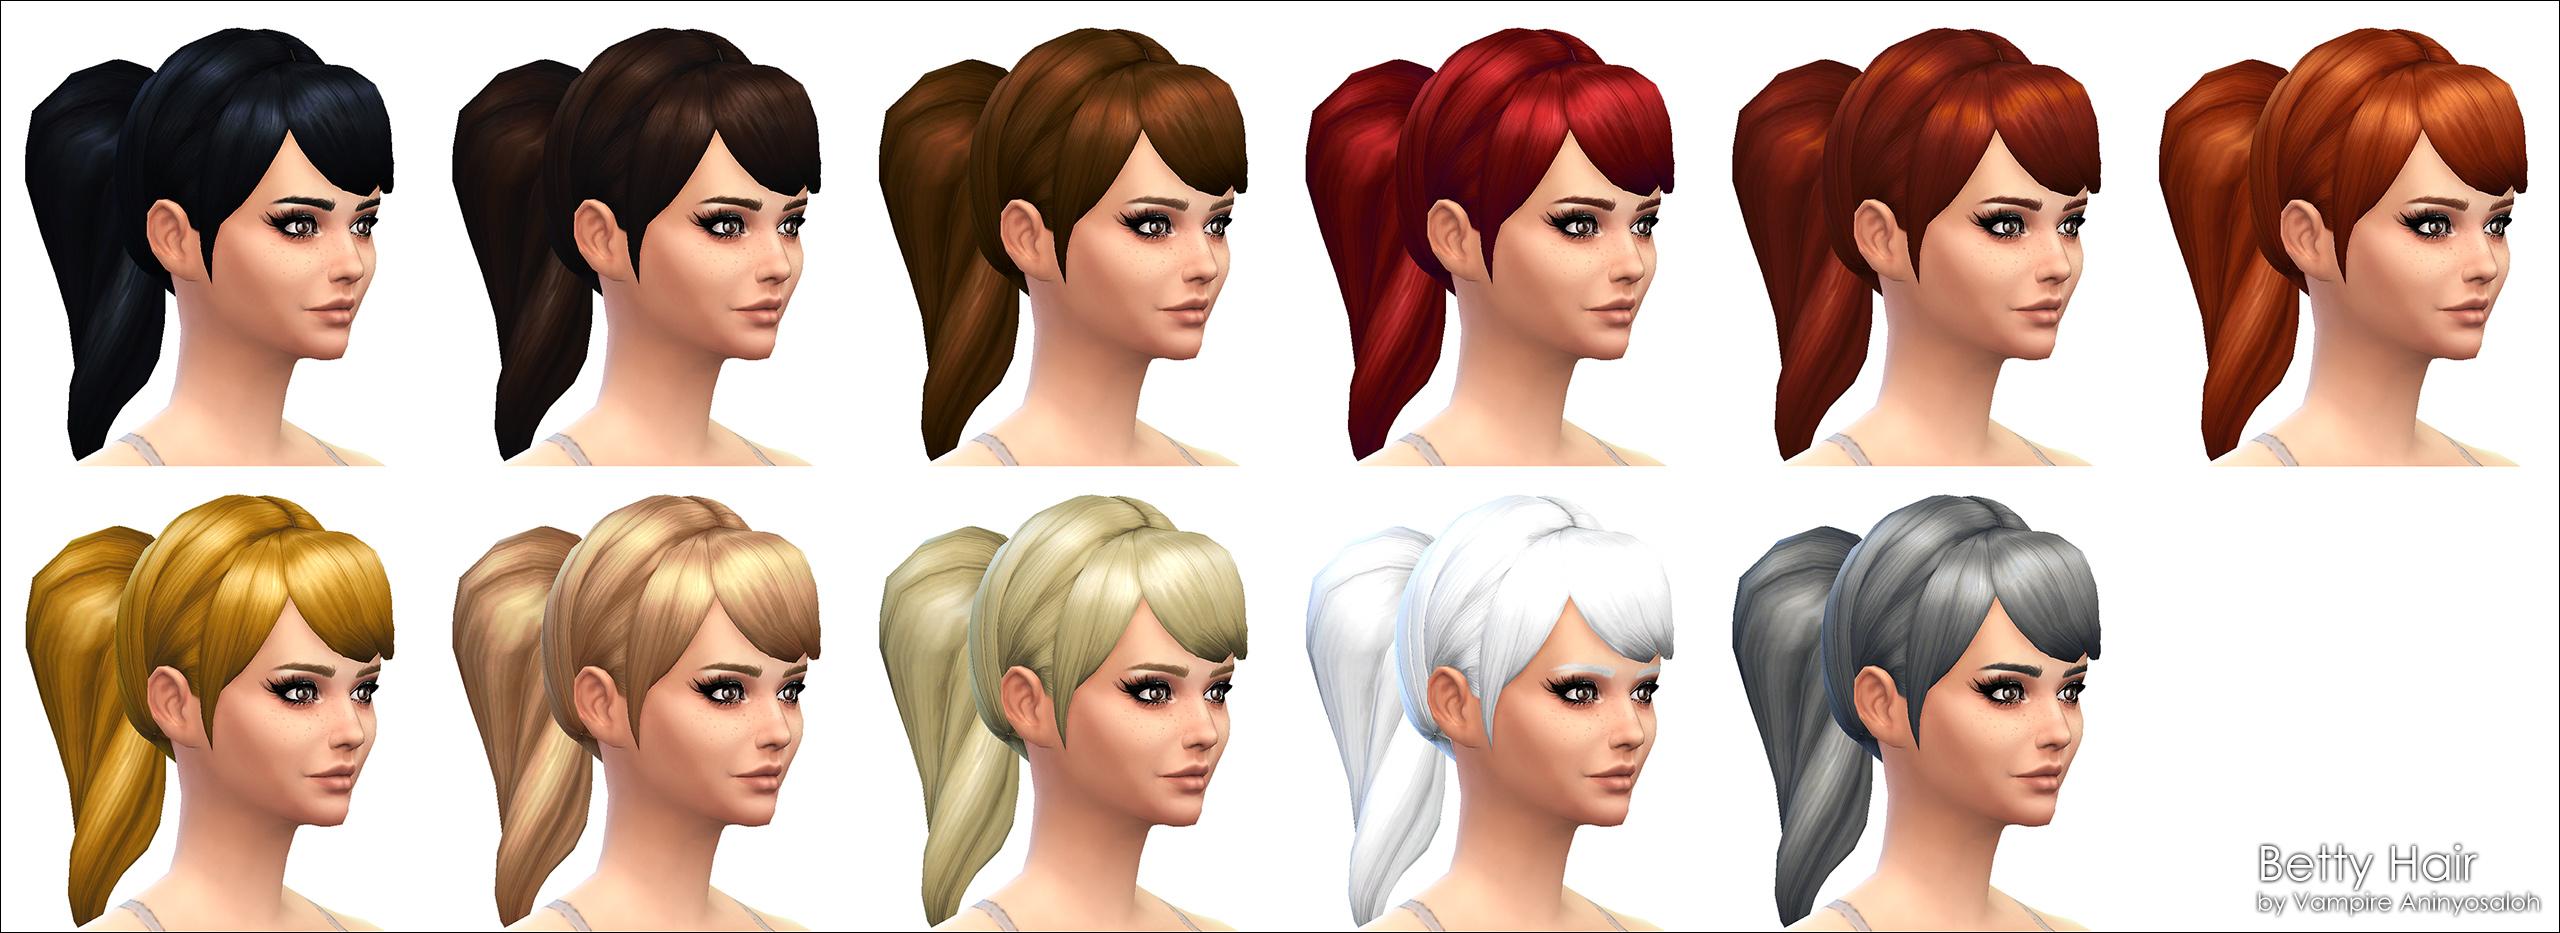 Mod The Sims Betty Hair New Mesh